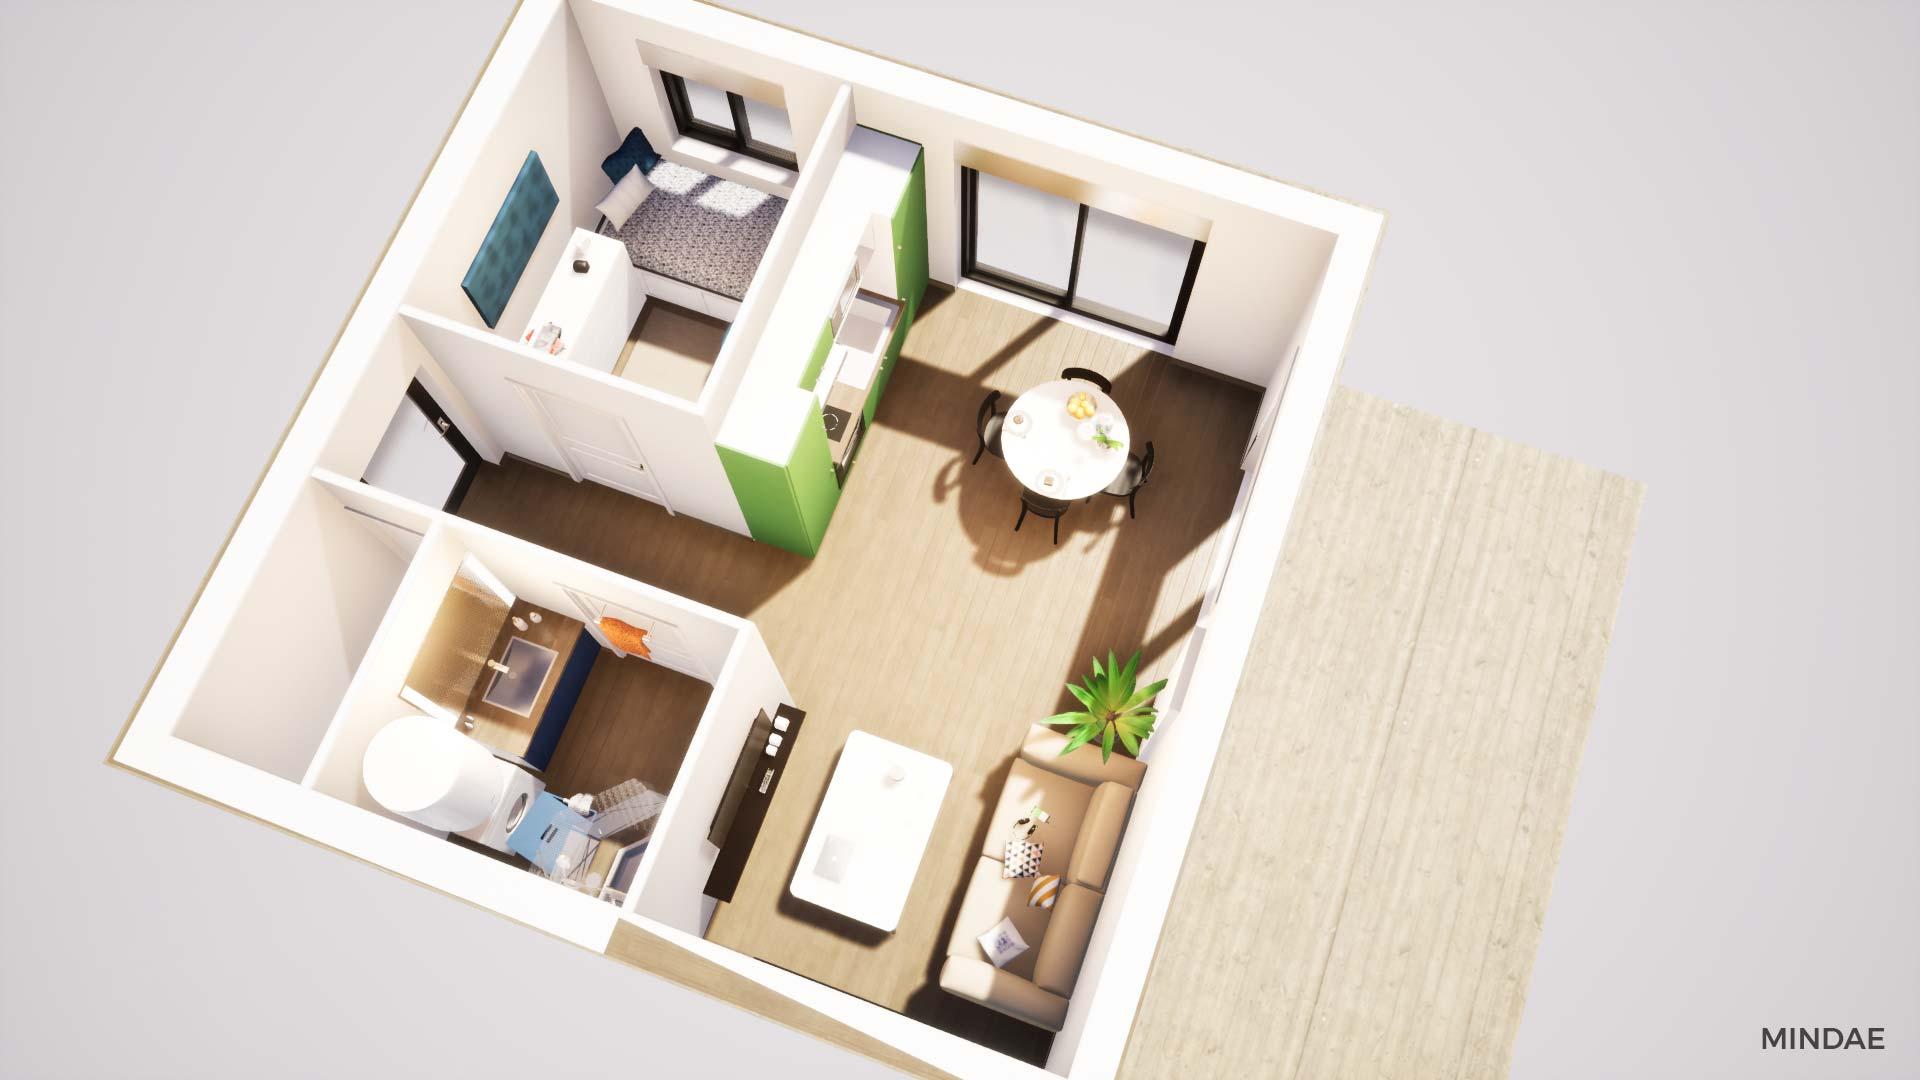 Mindae_3D_appartement_studio_étudiant_homestaging_immobilier_location-(5)